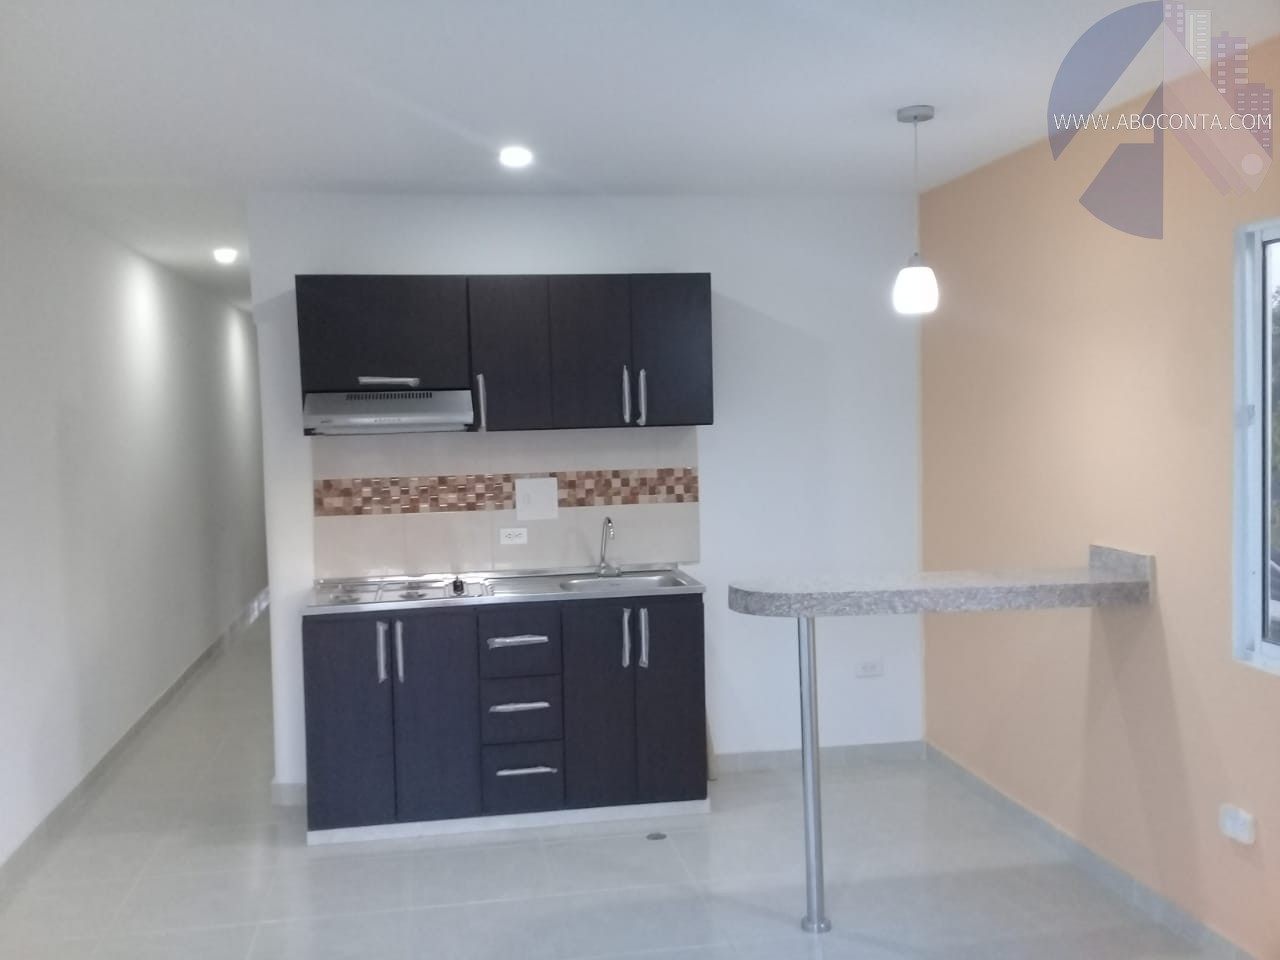 Hermoso apartamento ubicado en San Fernando